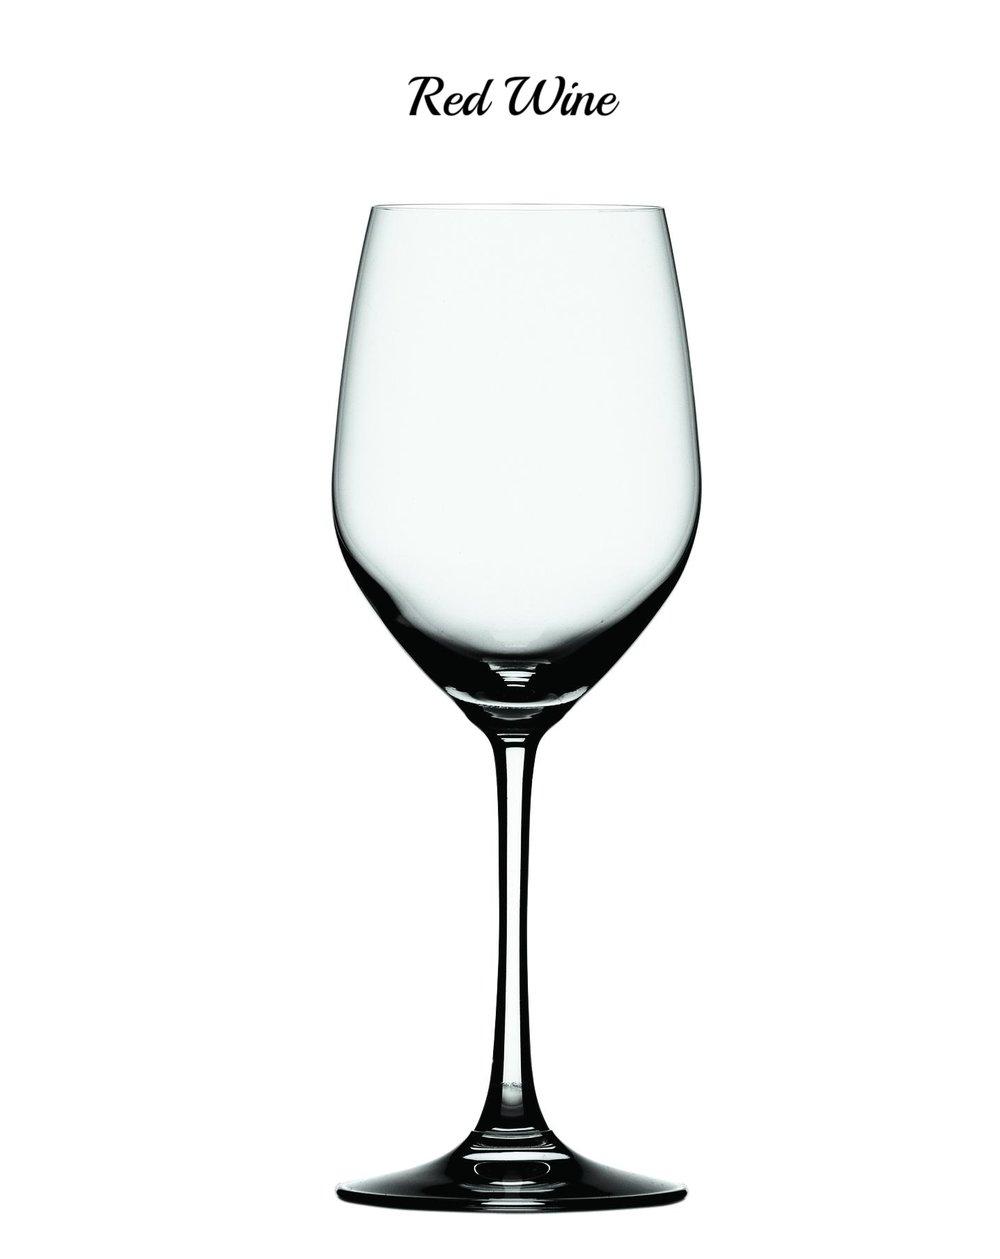 Red Wine 4510271.jpg